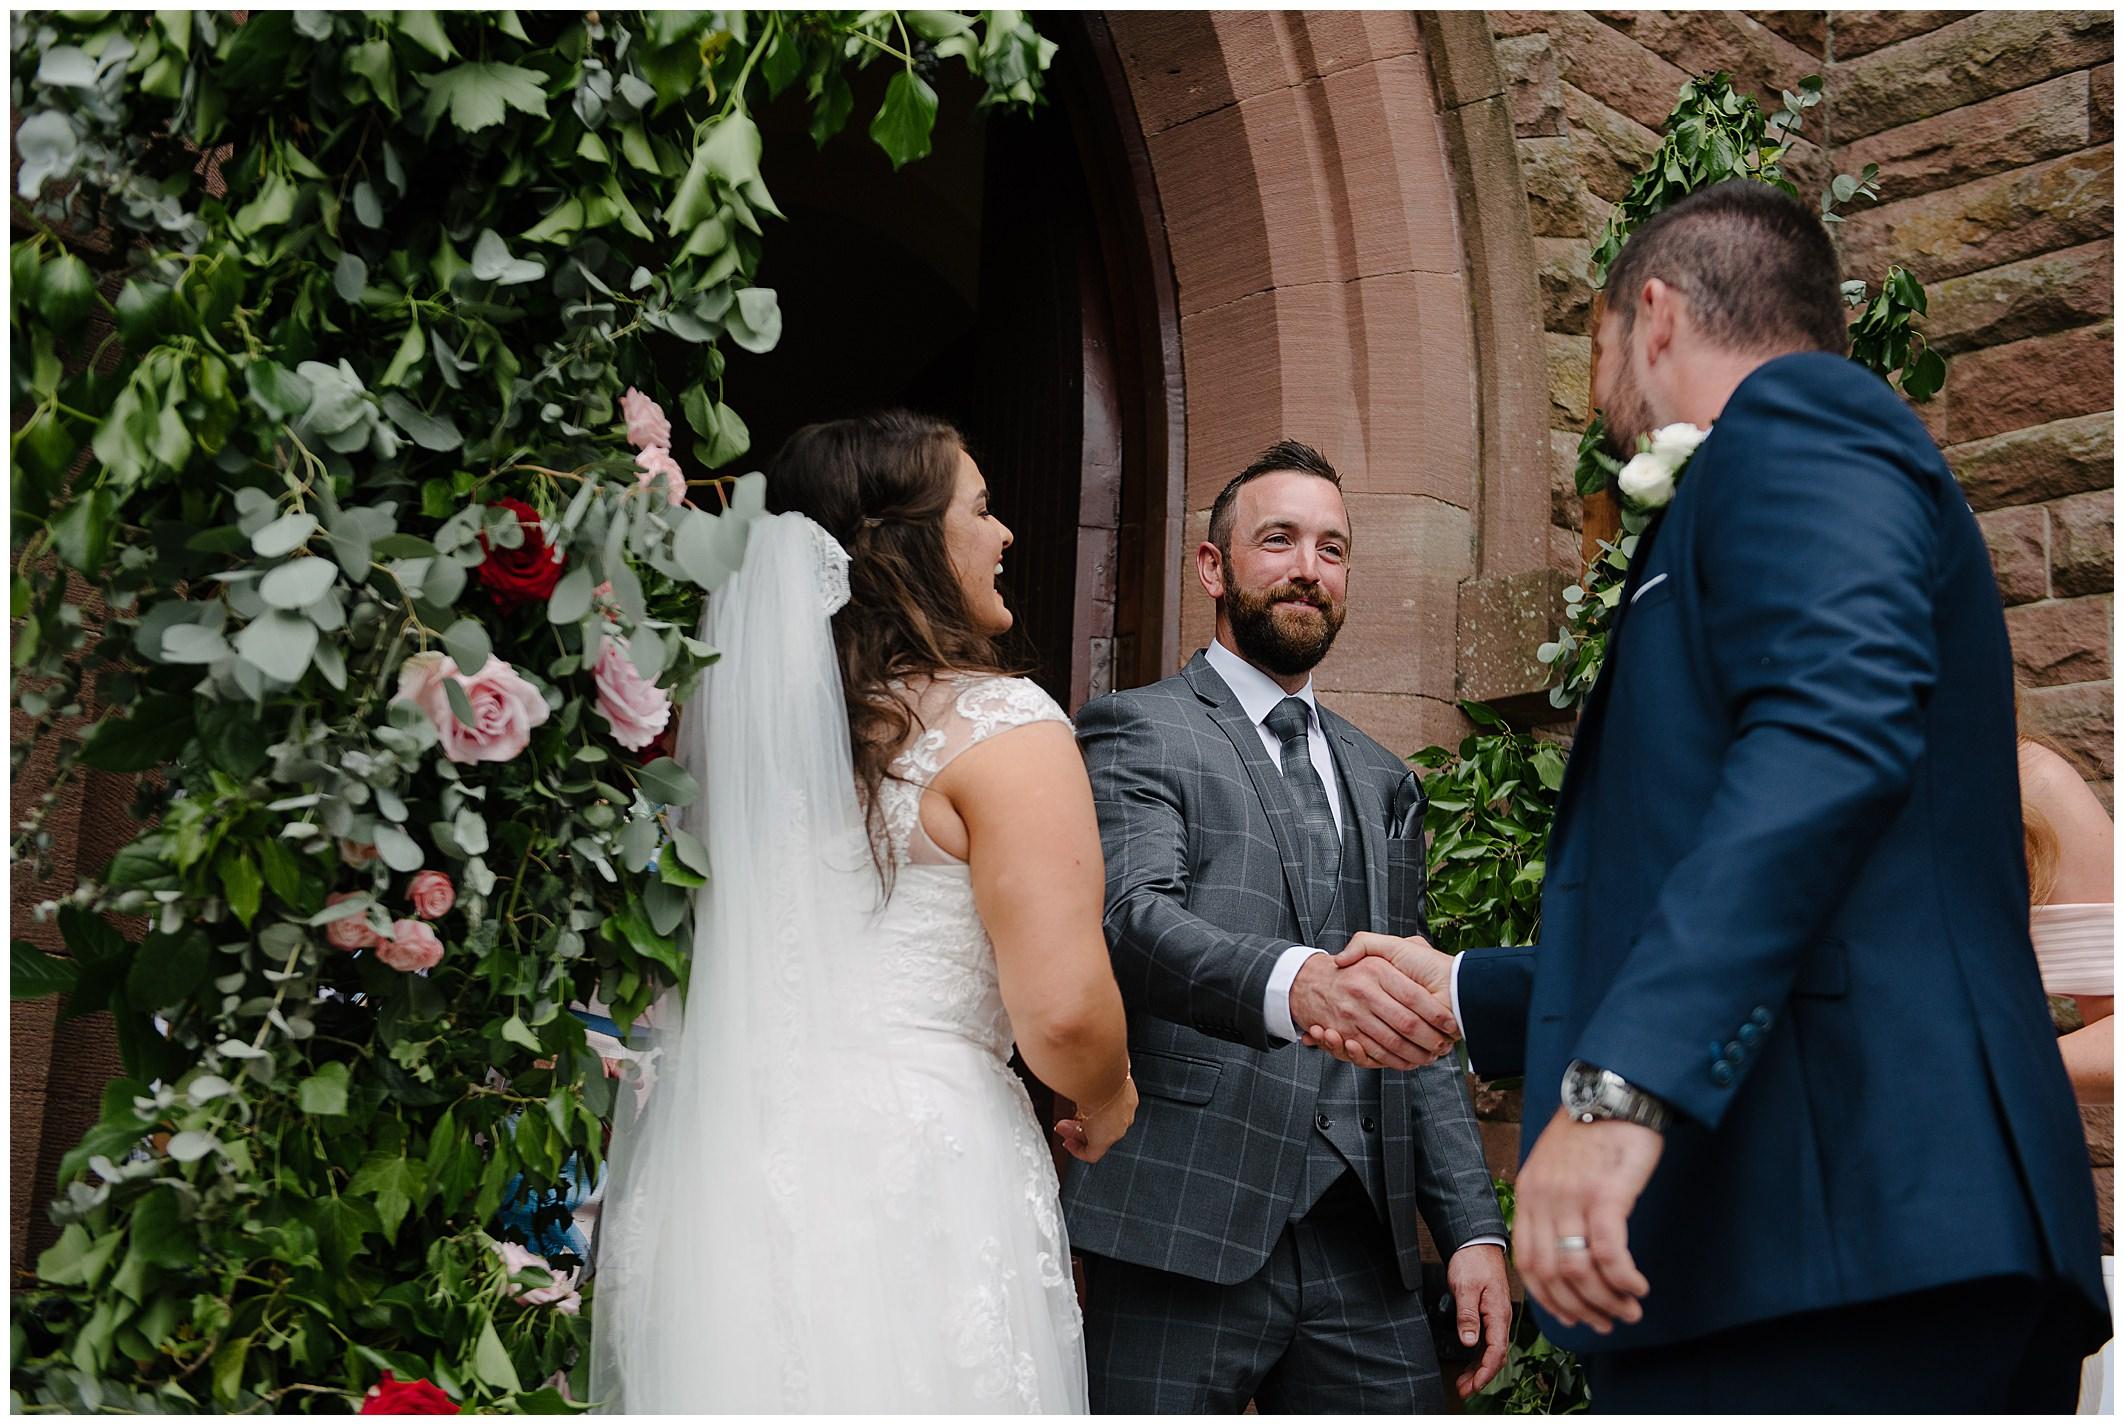 redcastle-hotel-wedding-karen-brian-jude-browne-photography-088.jpg